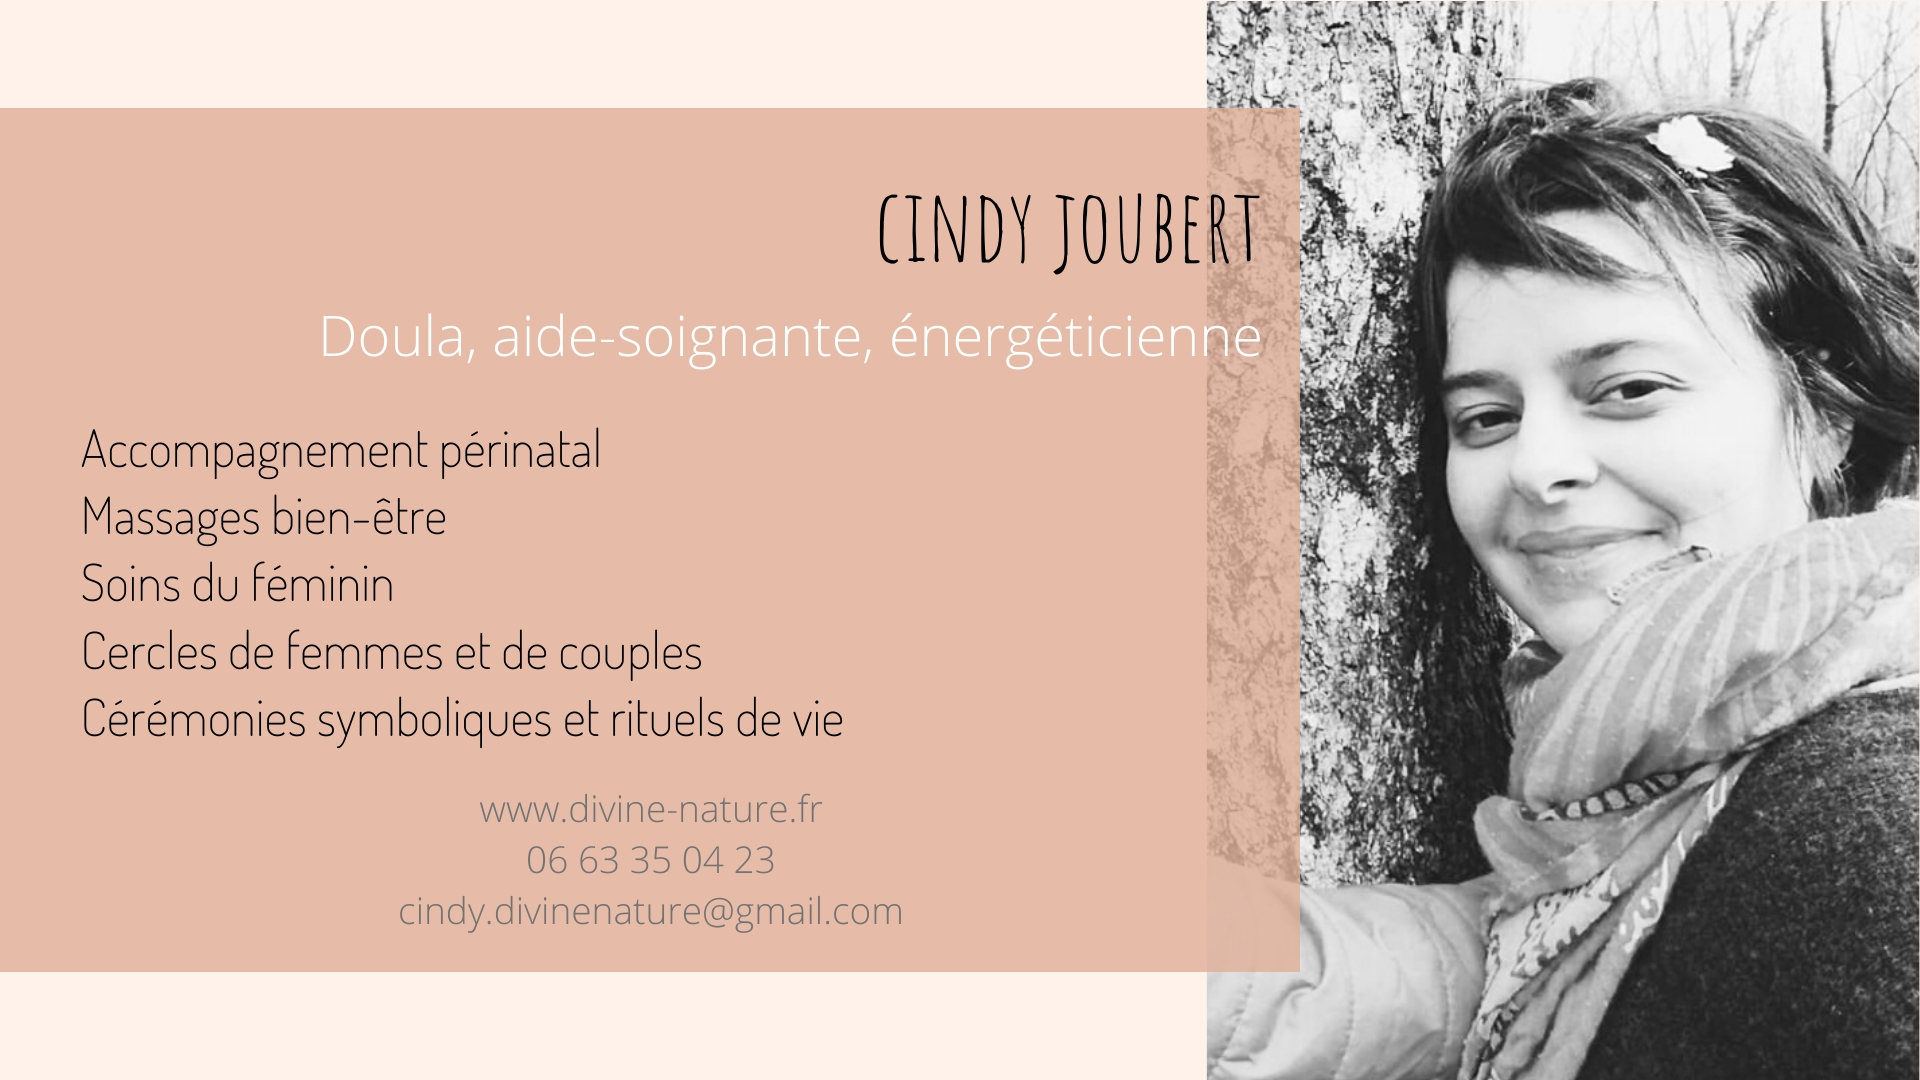 Cindy Joubert